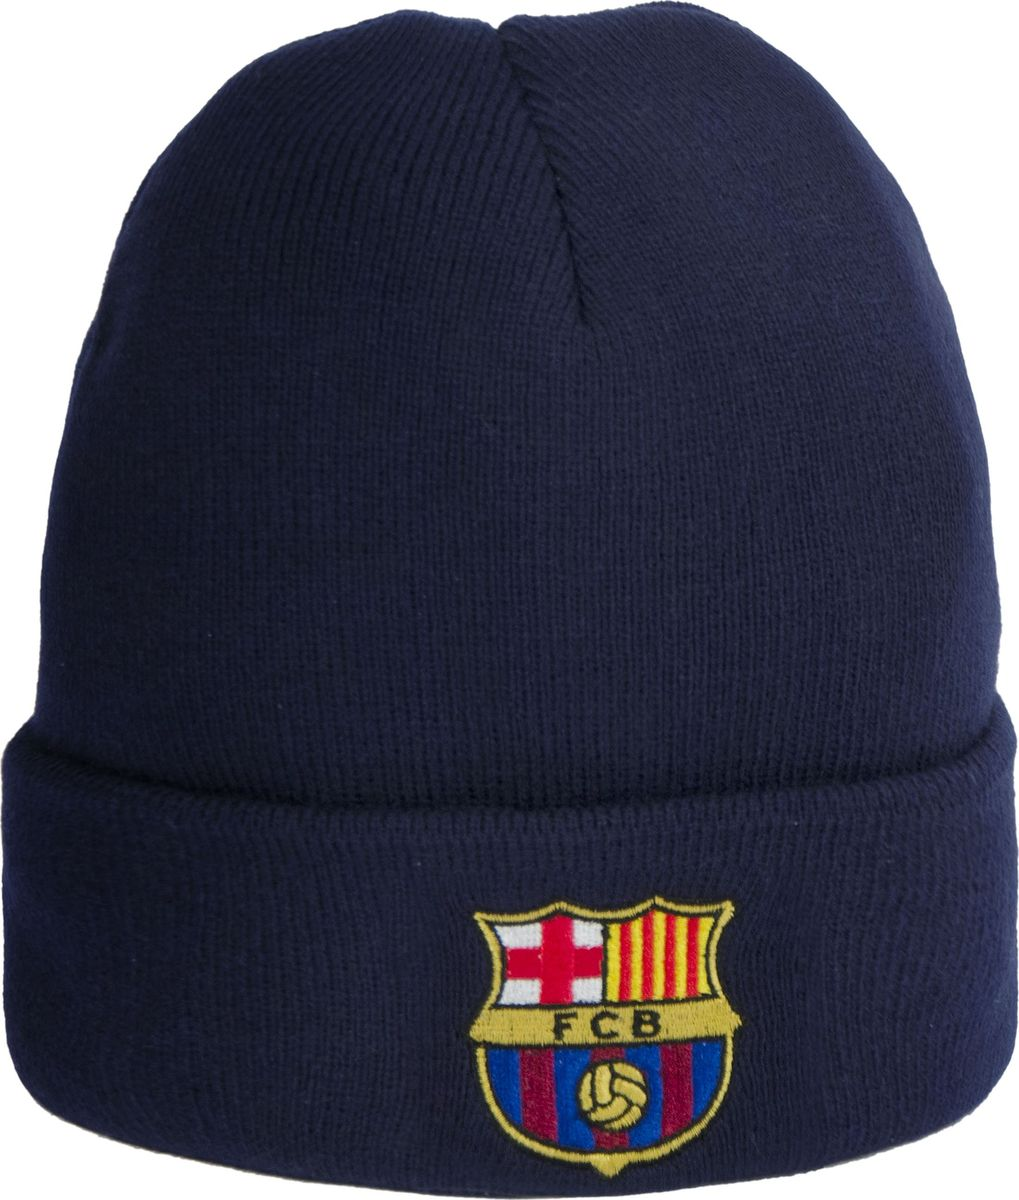 Шапка мужская Atributika & Club Barcelona, цвет: темно-синий. 115111. Размер 55/58